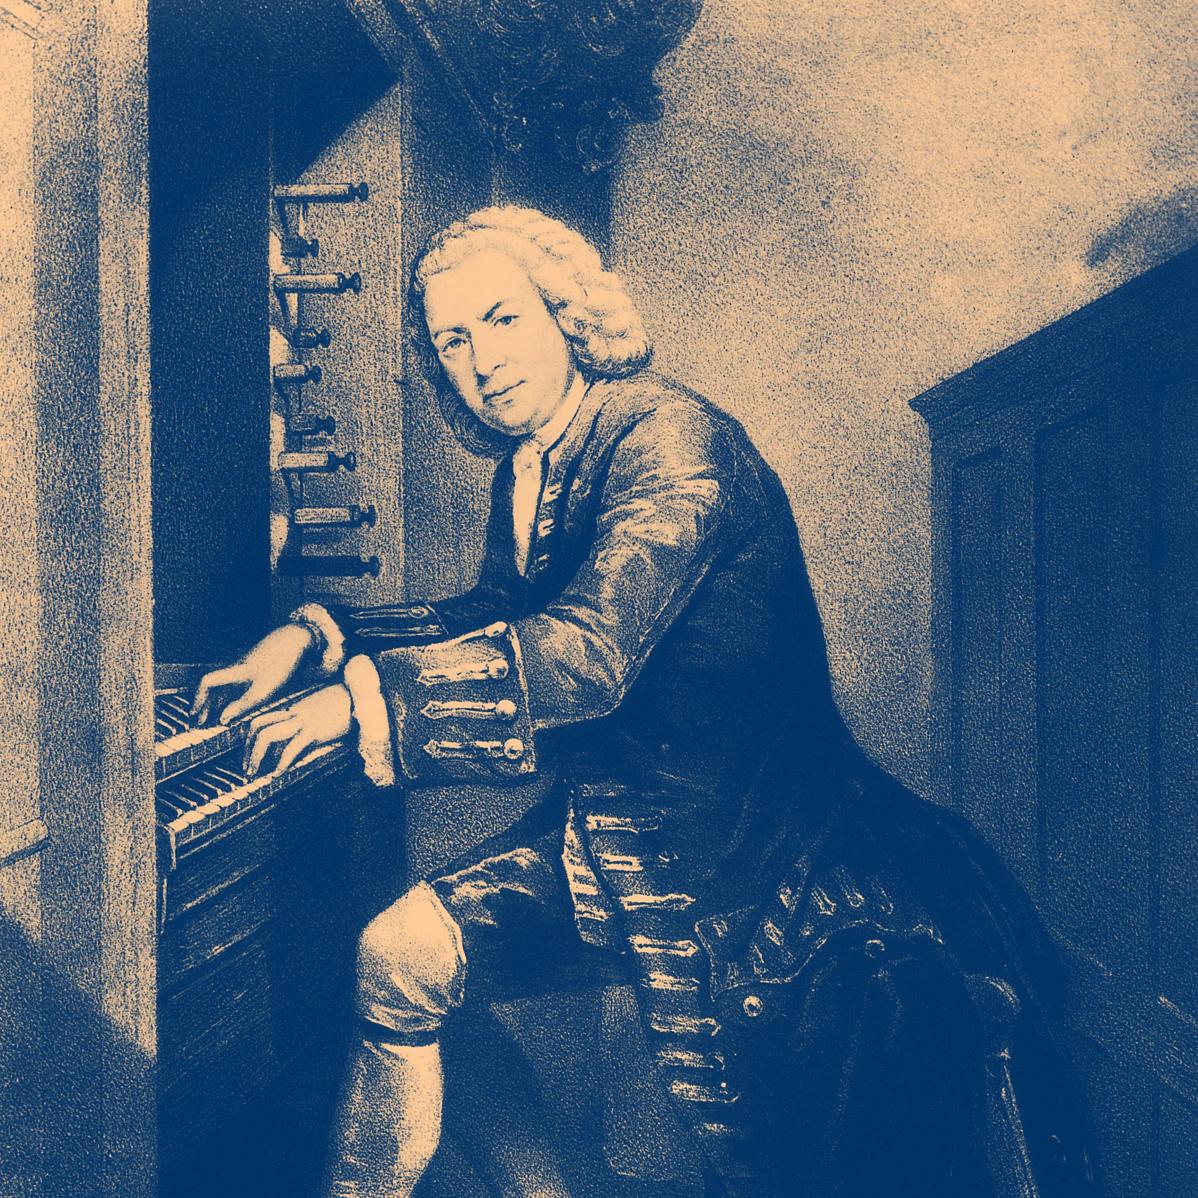 Bach-1725-Organ-165434.jpg